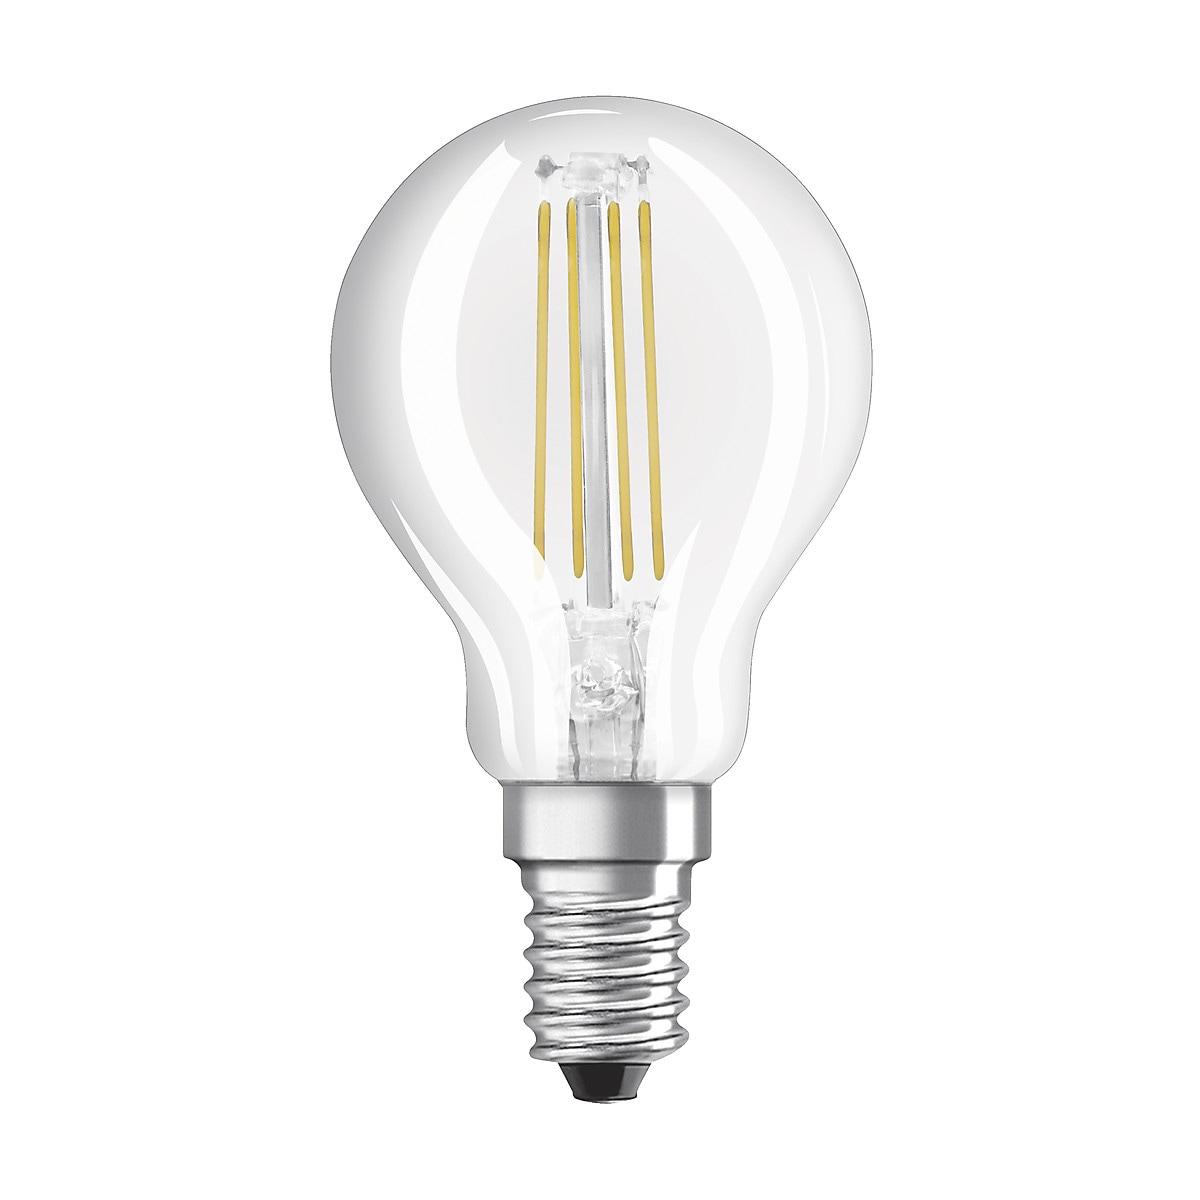 Pallolamppu Active and Relax Classic LED E14 Osram